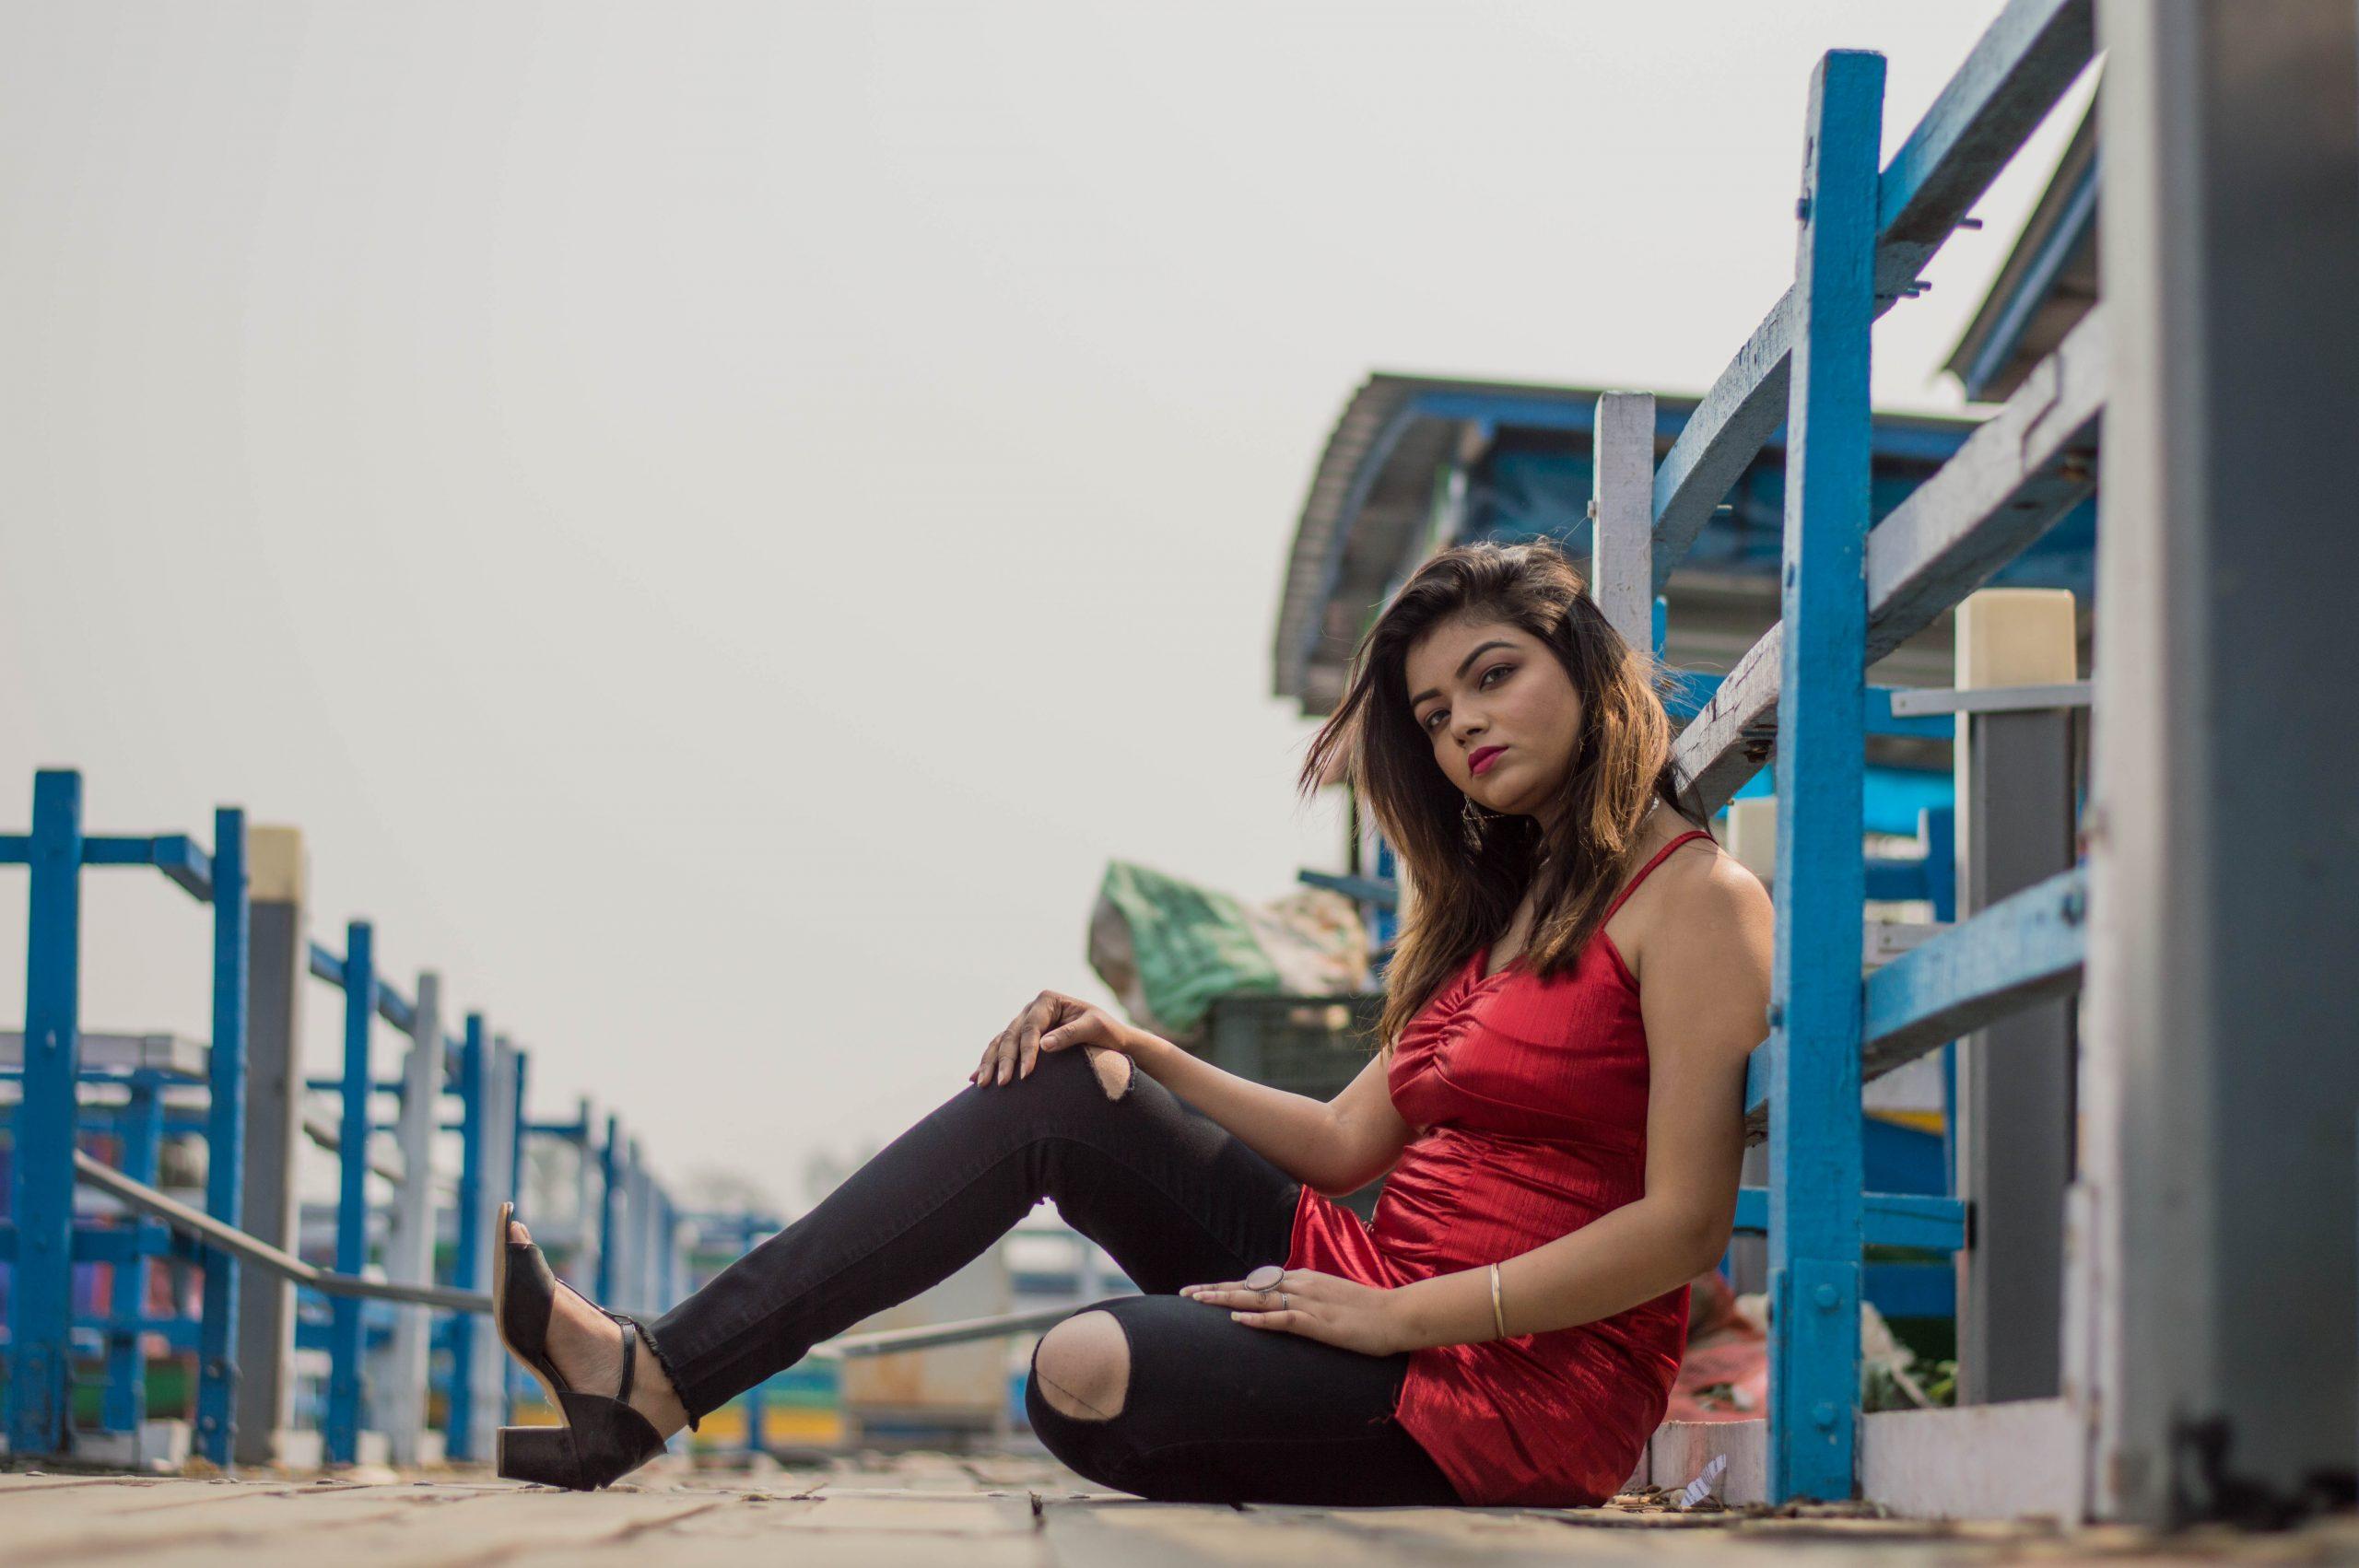 A stylish girl